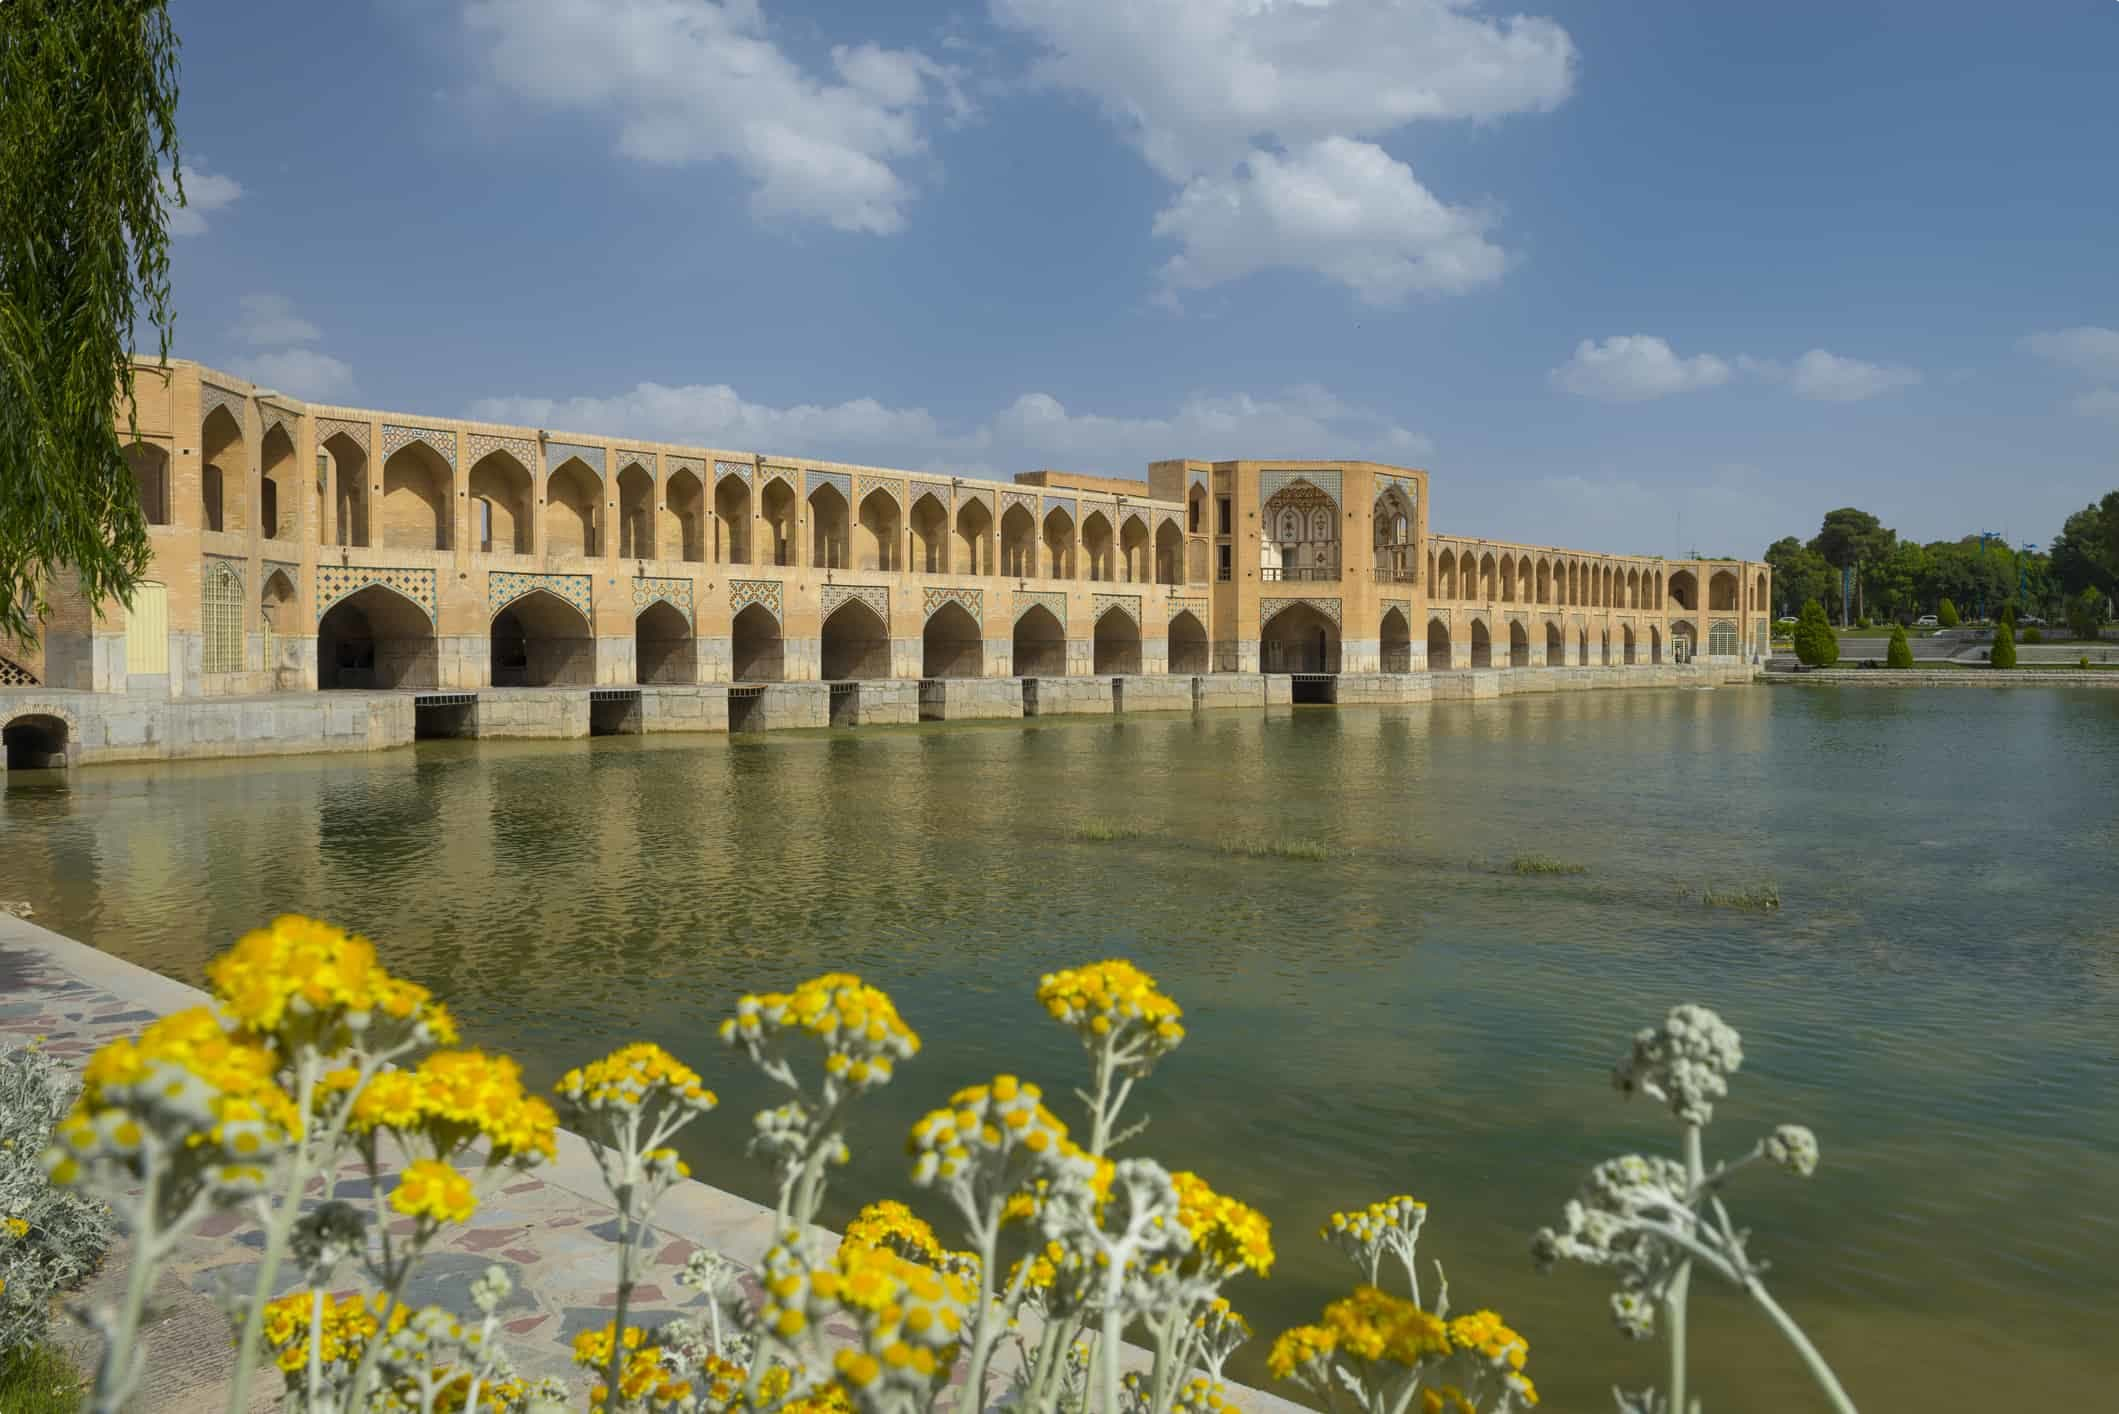 Khaju Bridge in Isfahan, Iran.